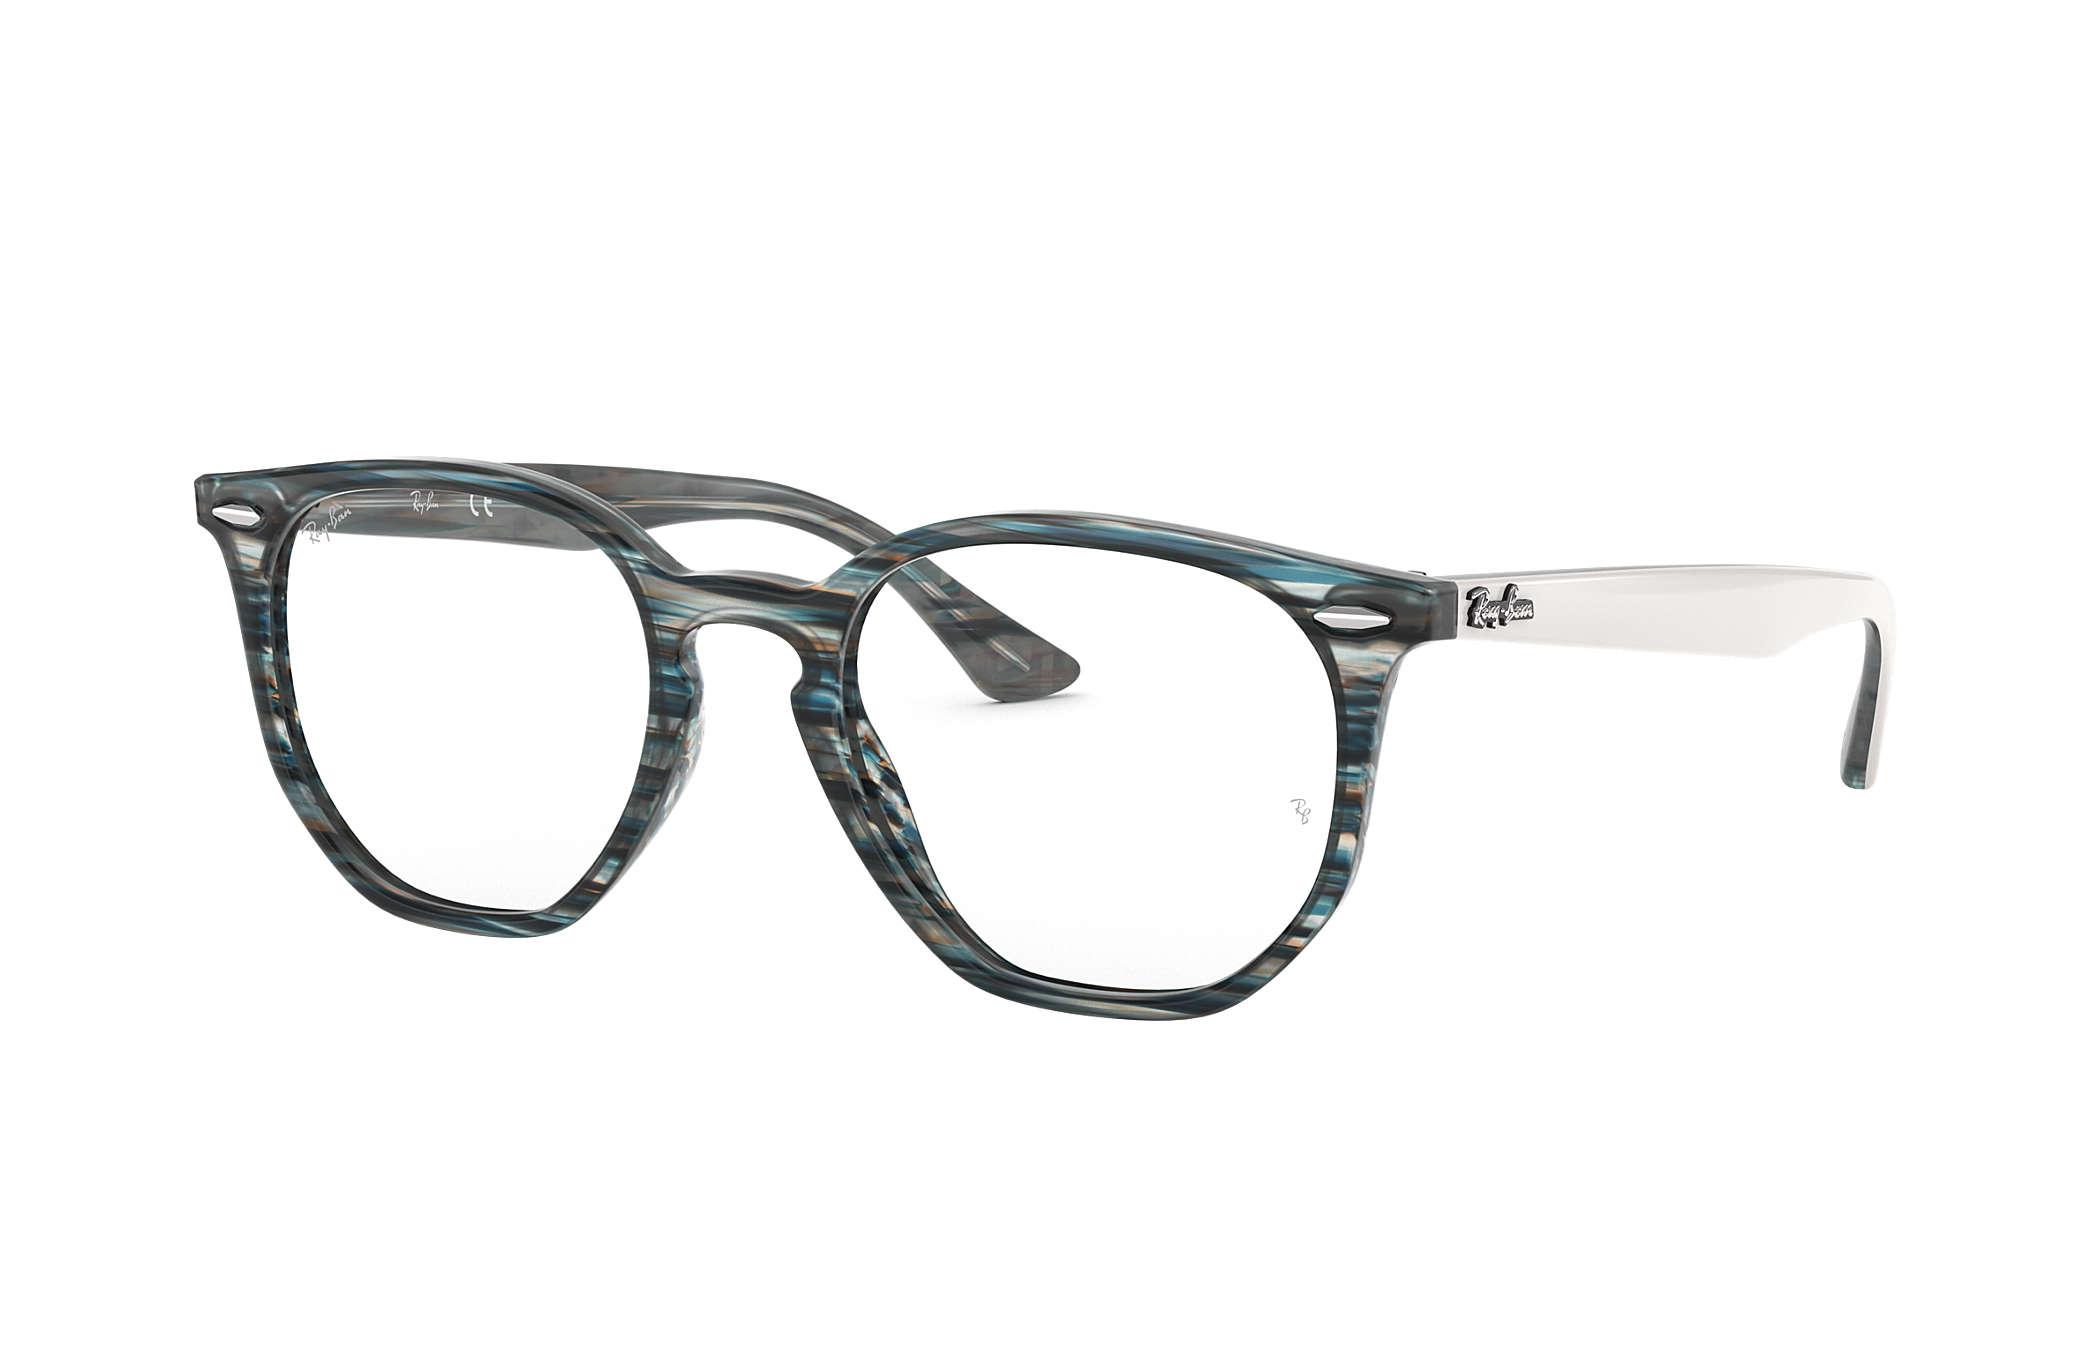 ed4be76ec Óculos de grau Ray-Ban Hexagonal Optics RB7151 Azul - Acetato ...